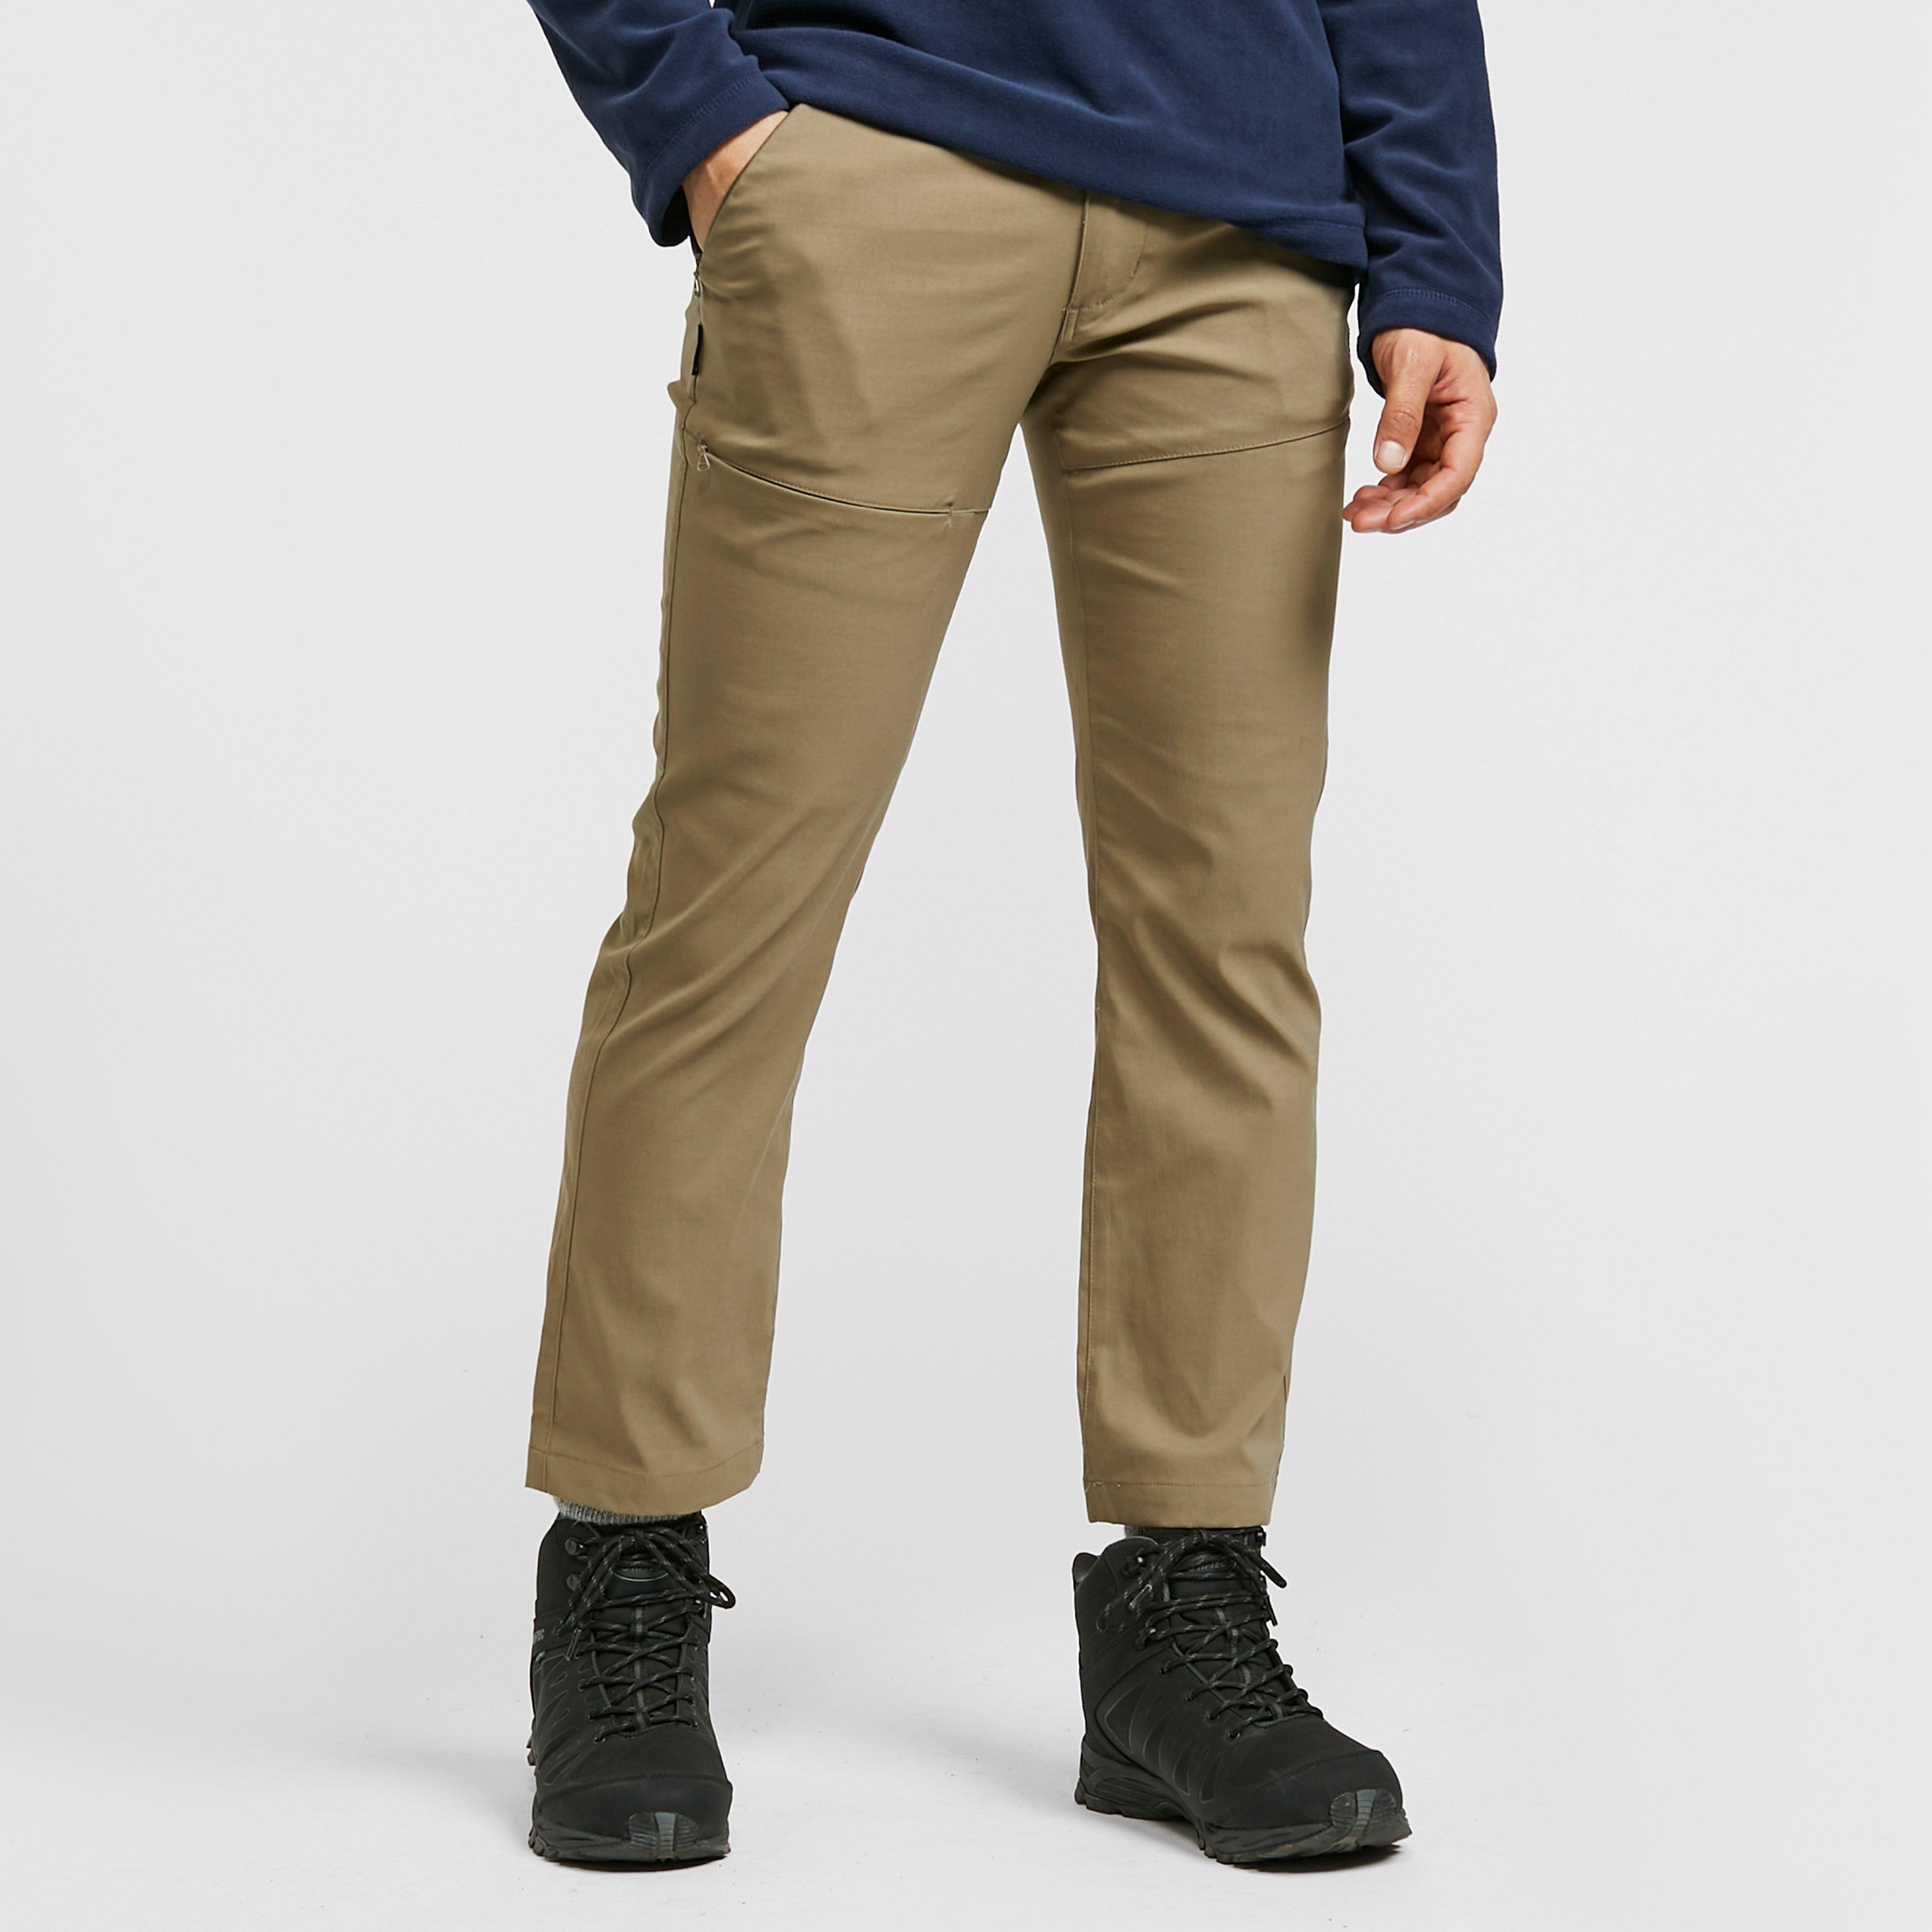 Craghoppers Mens Kiwi Pro Stretch Trousers (regular) - Beige/bei  Beige/bei